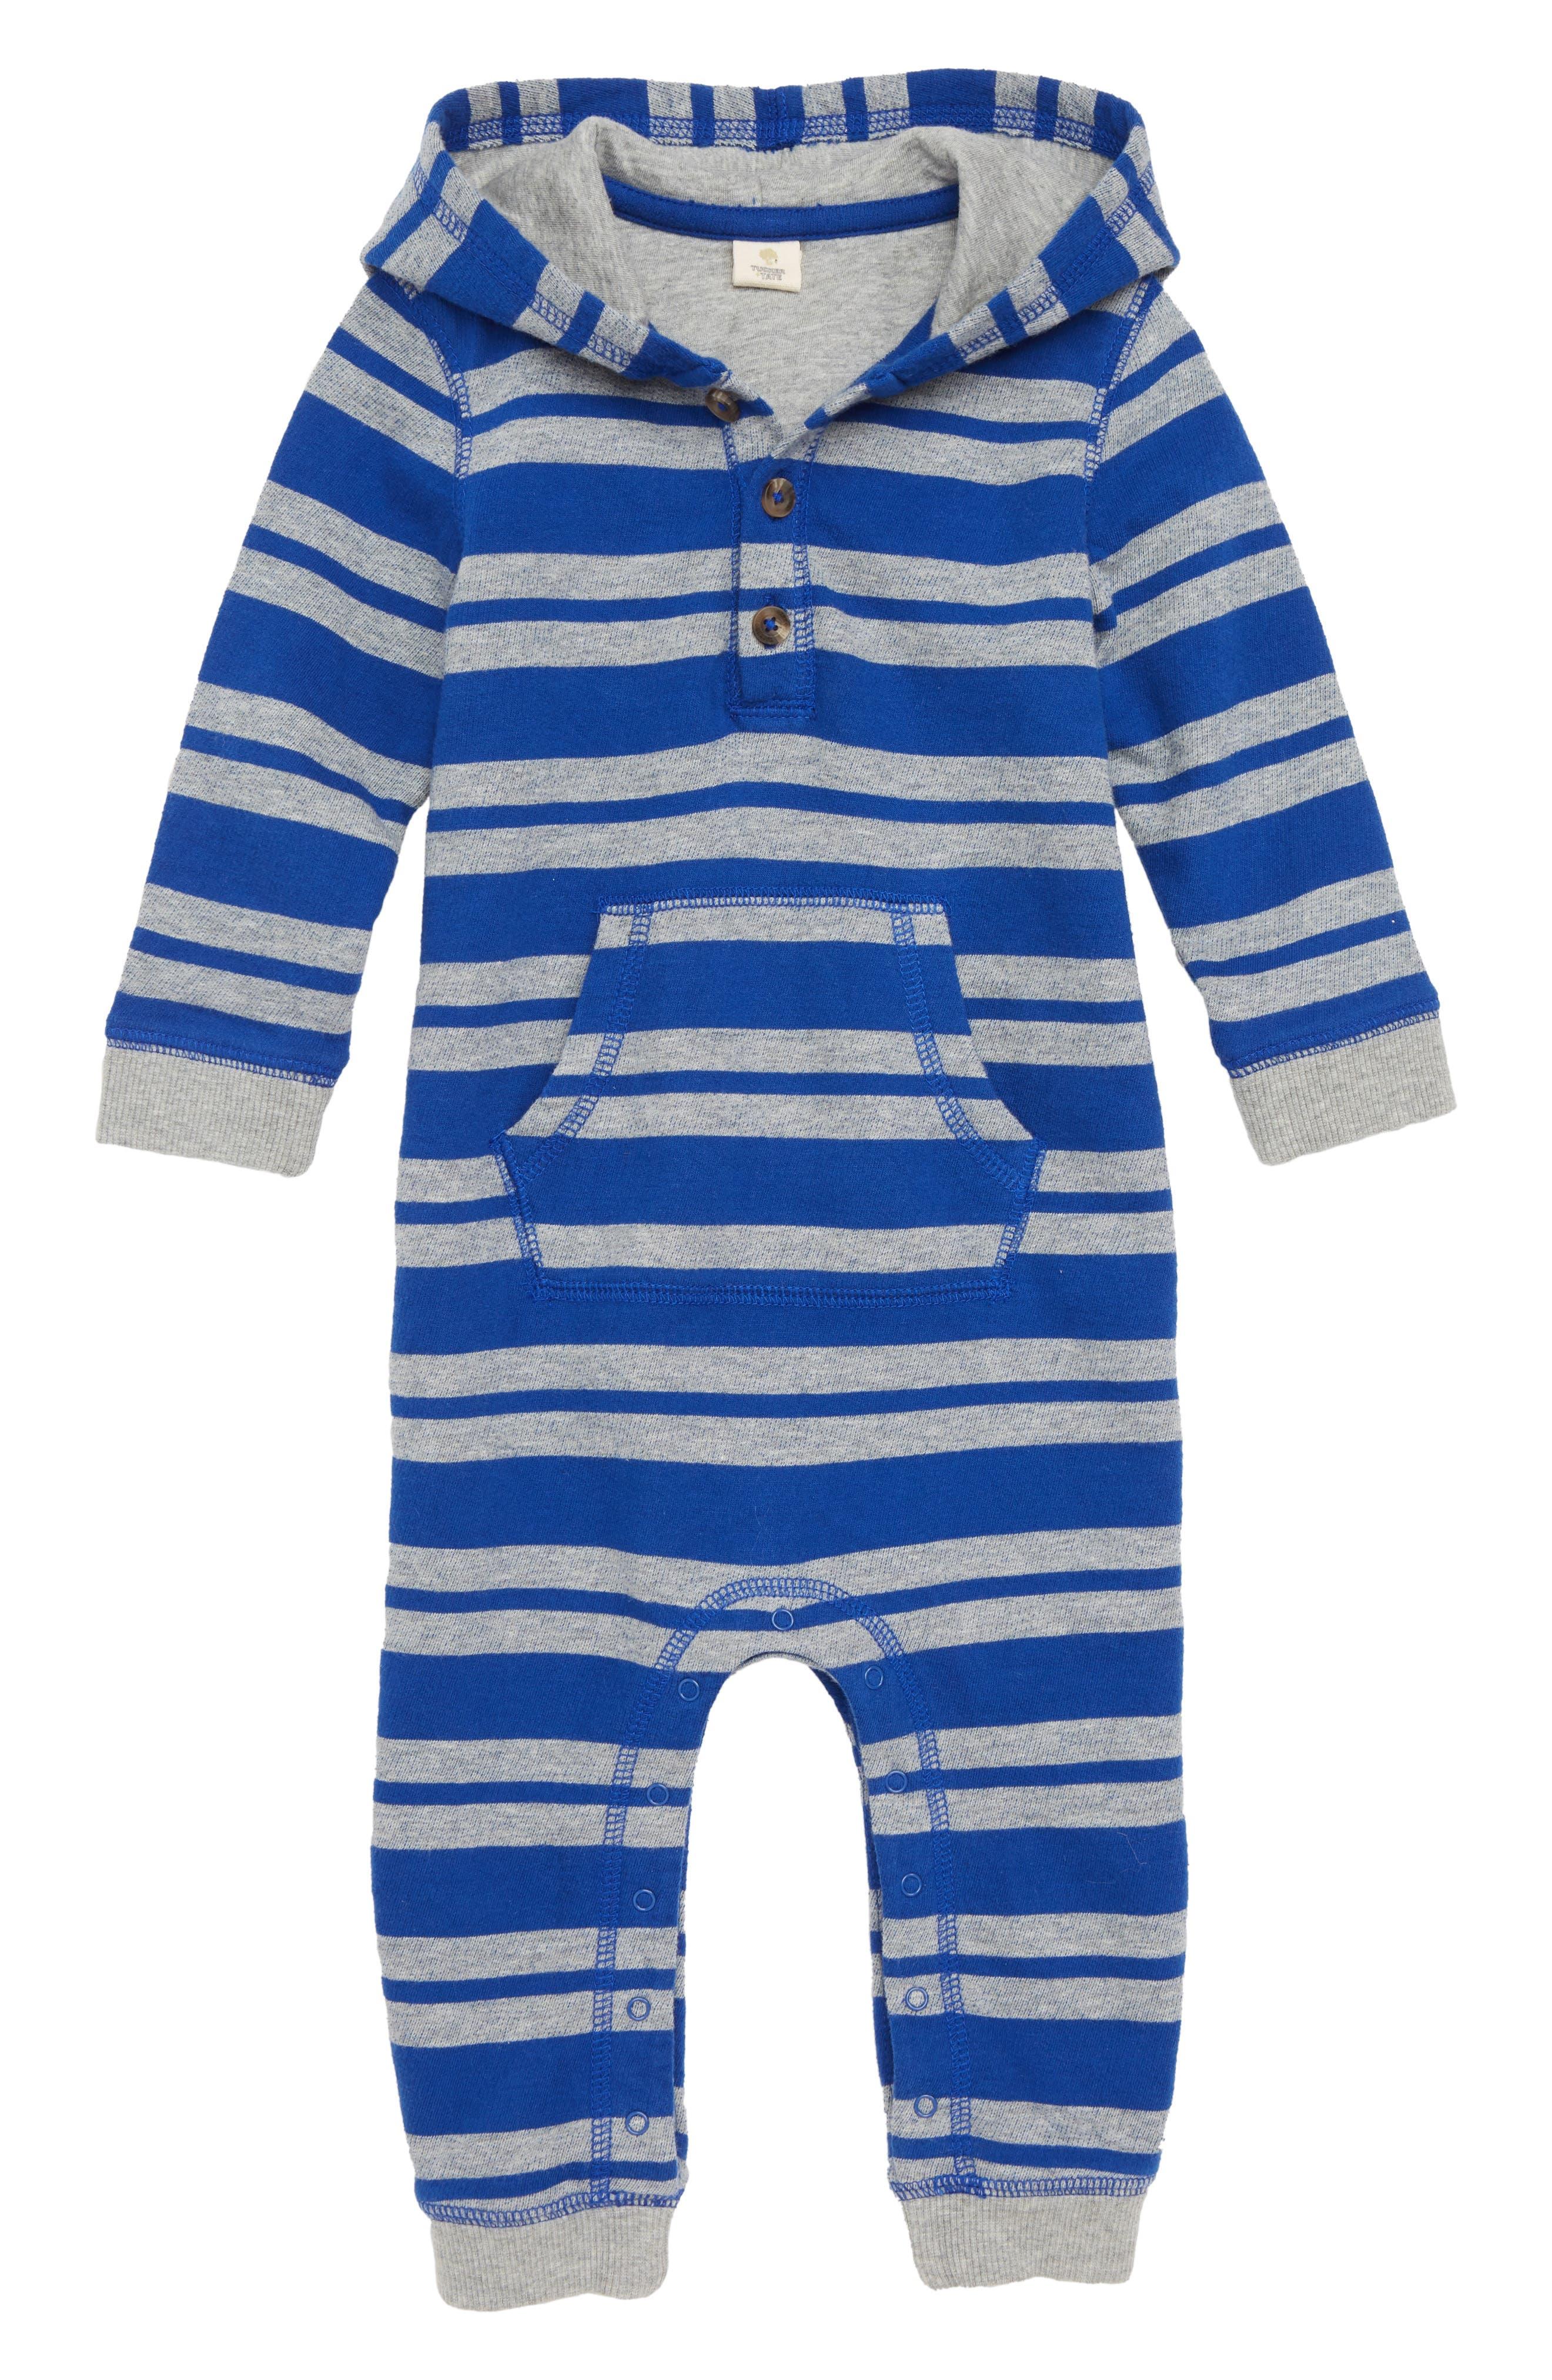 Stripe Hooded Romper,                             Main thumbnail 1, color,                             BLUE MAZARINE- GREY STRIPE